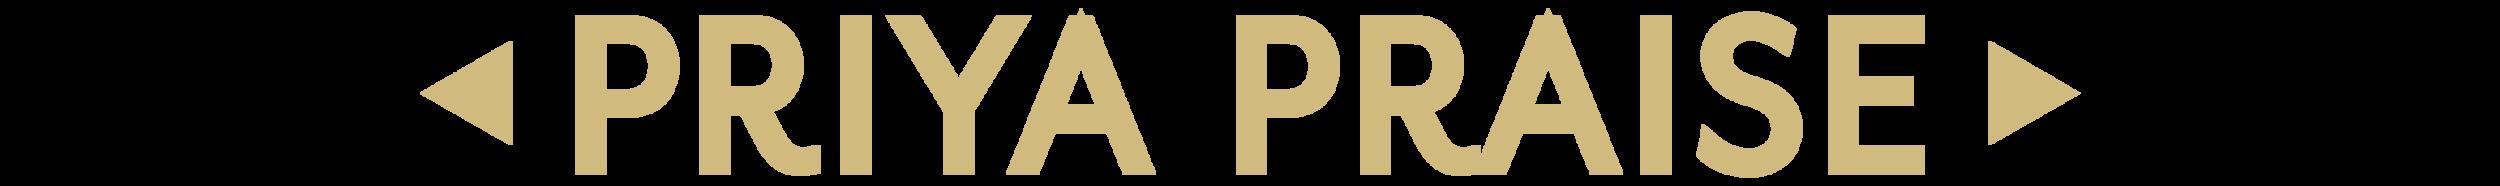 priya_praise.png